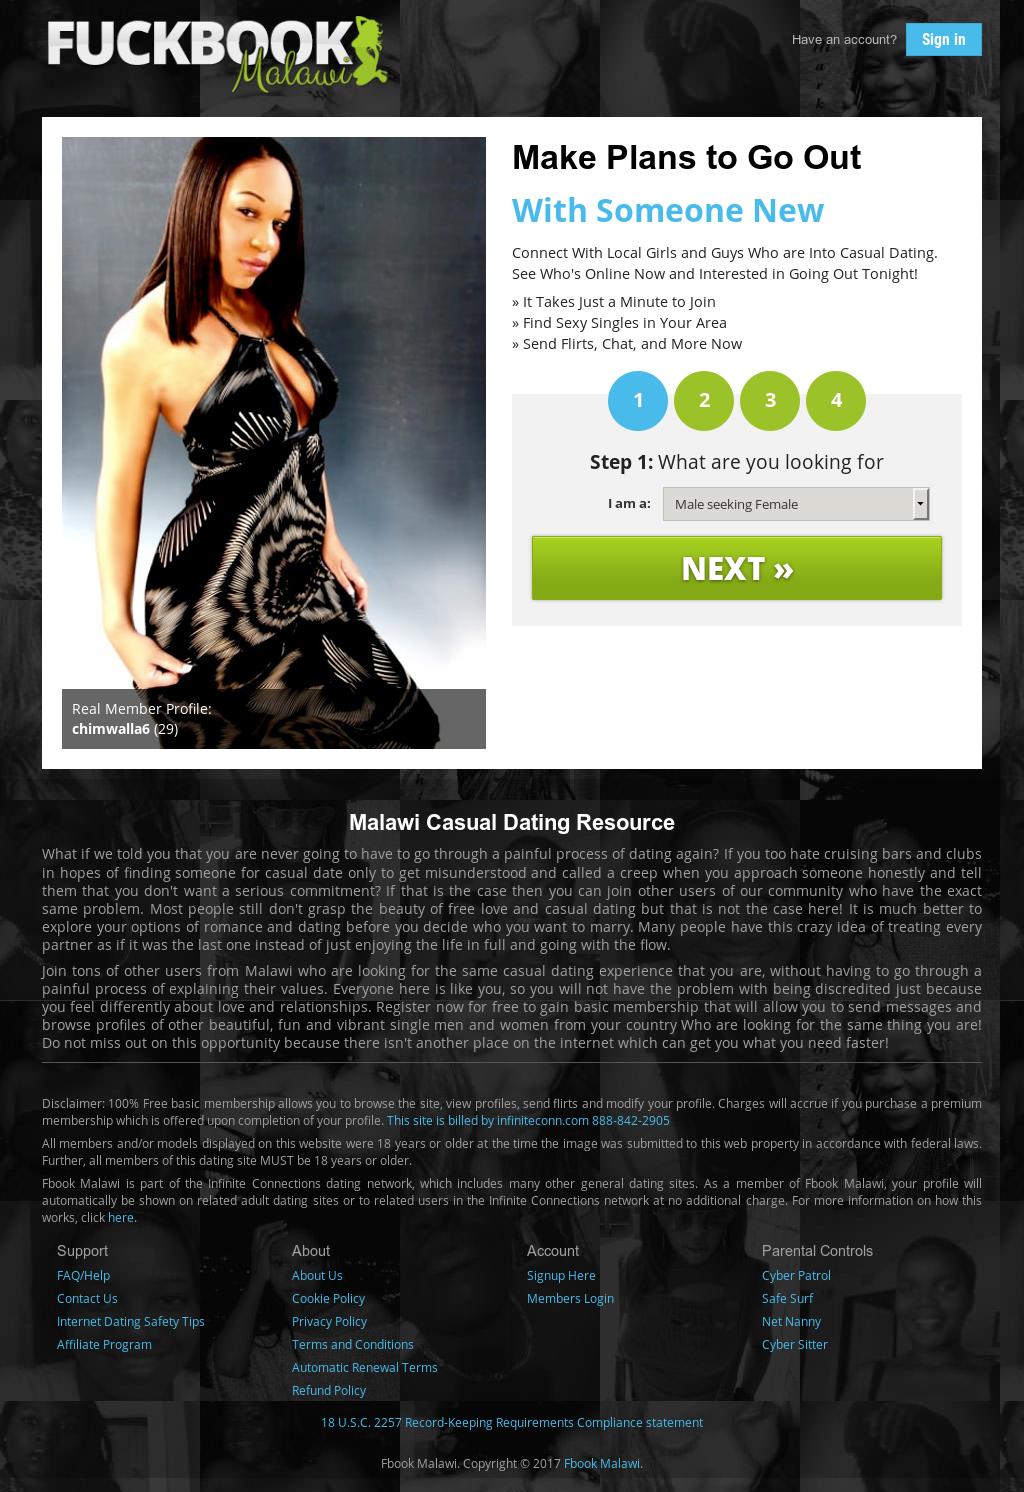 nuori dating sites UK